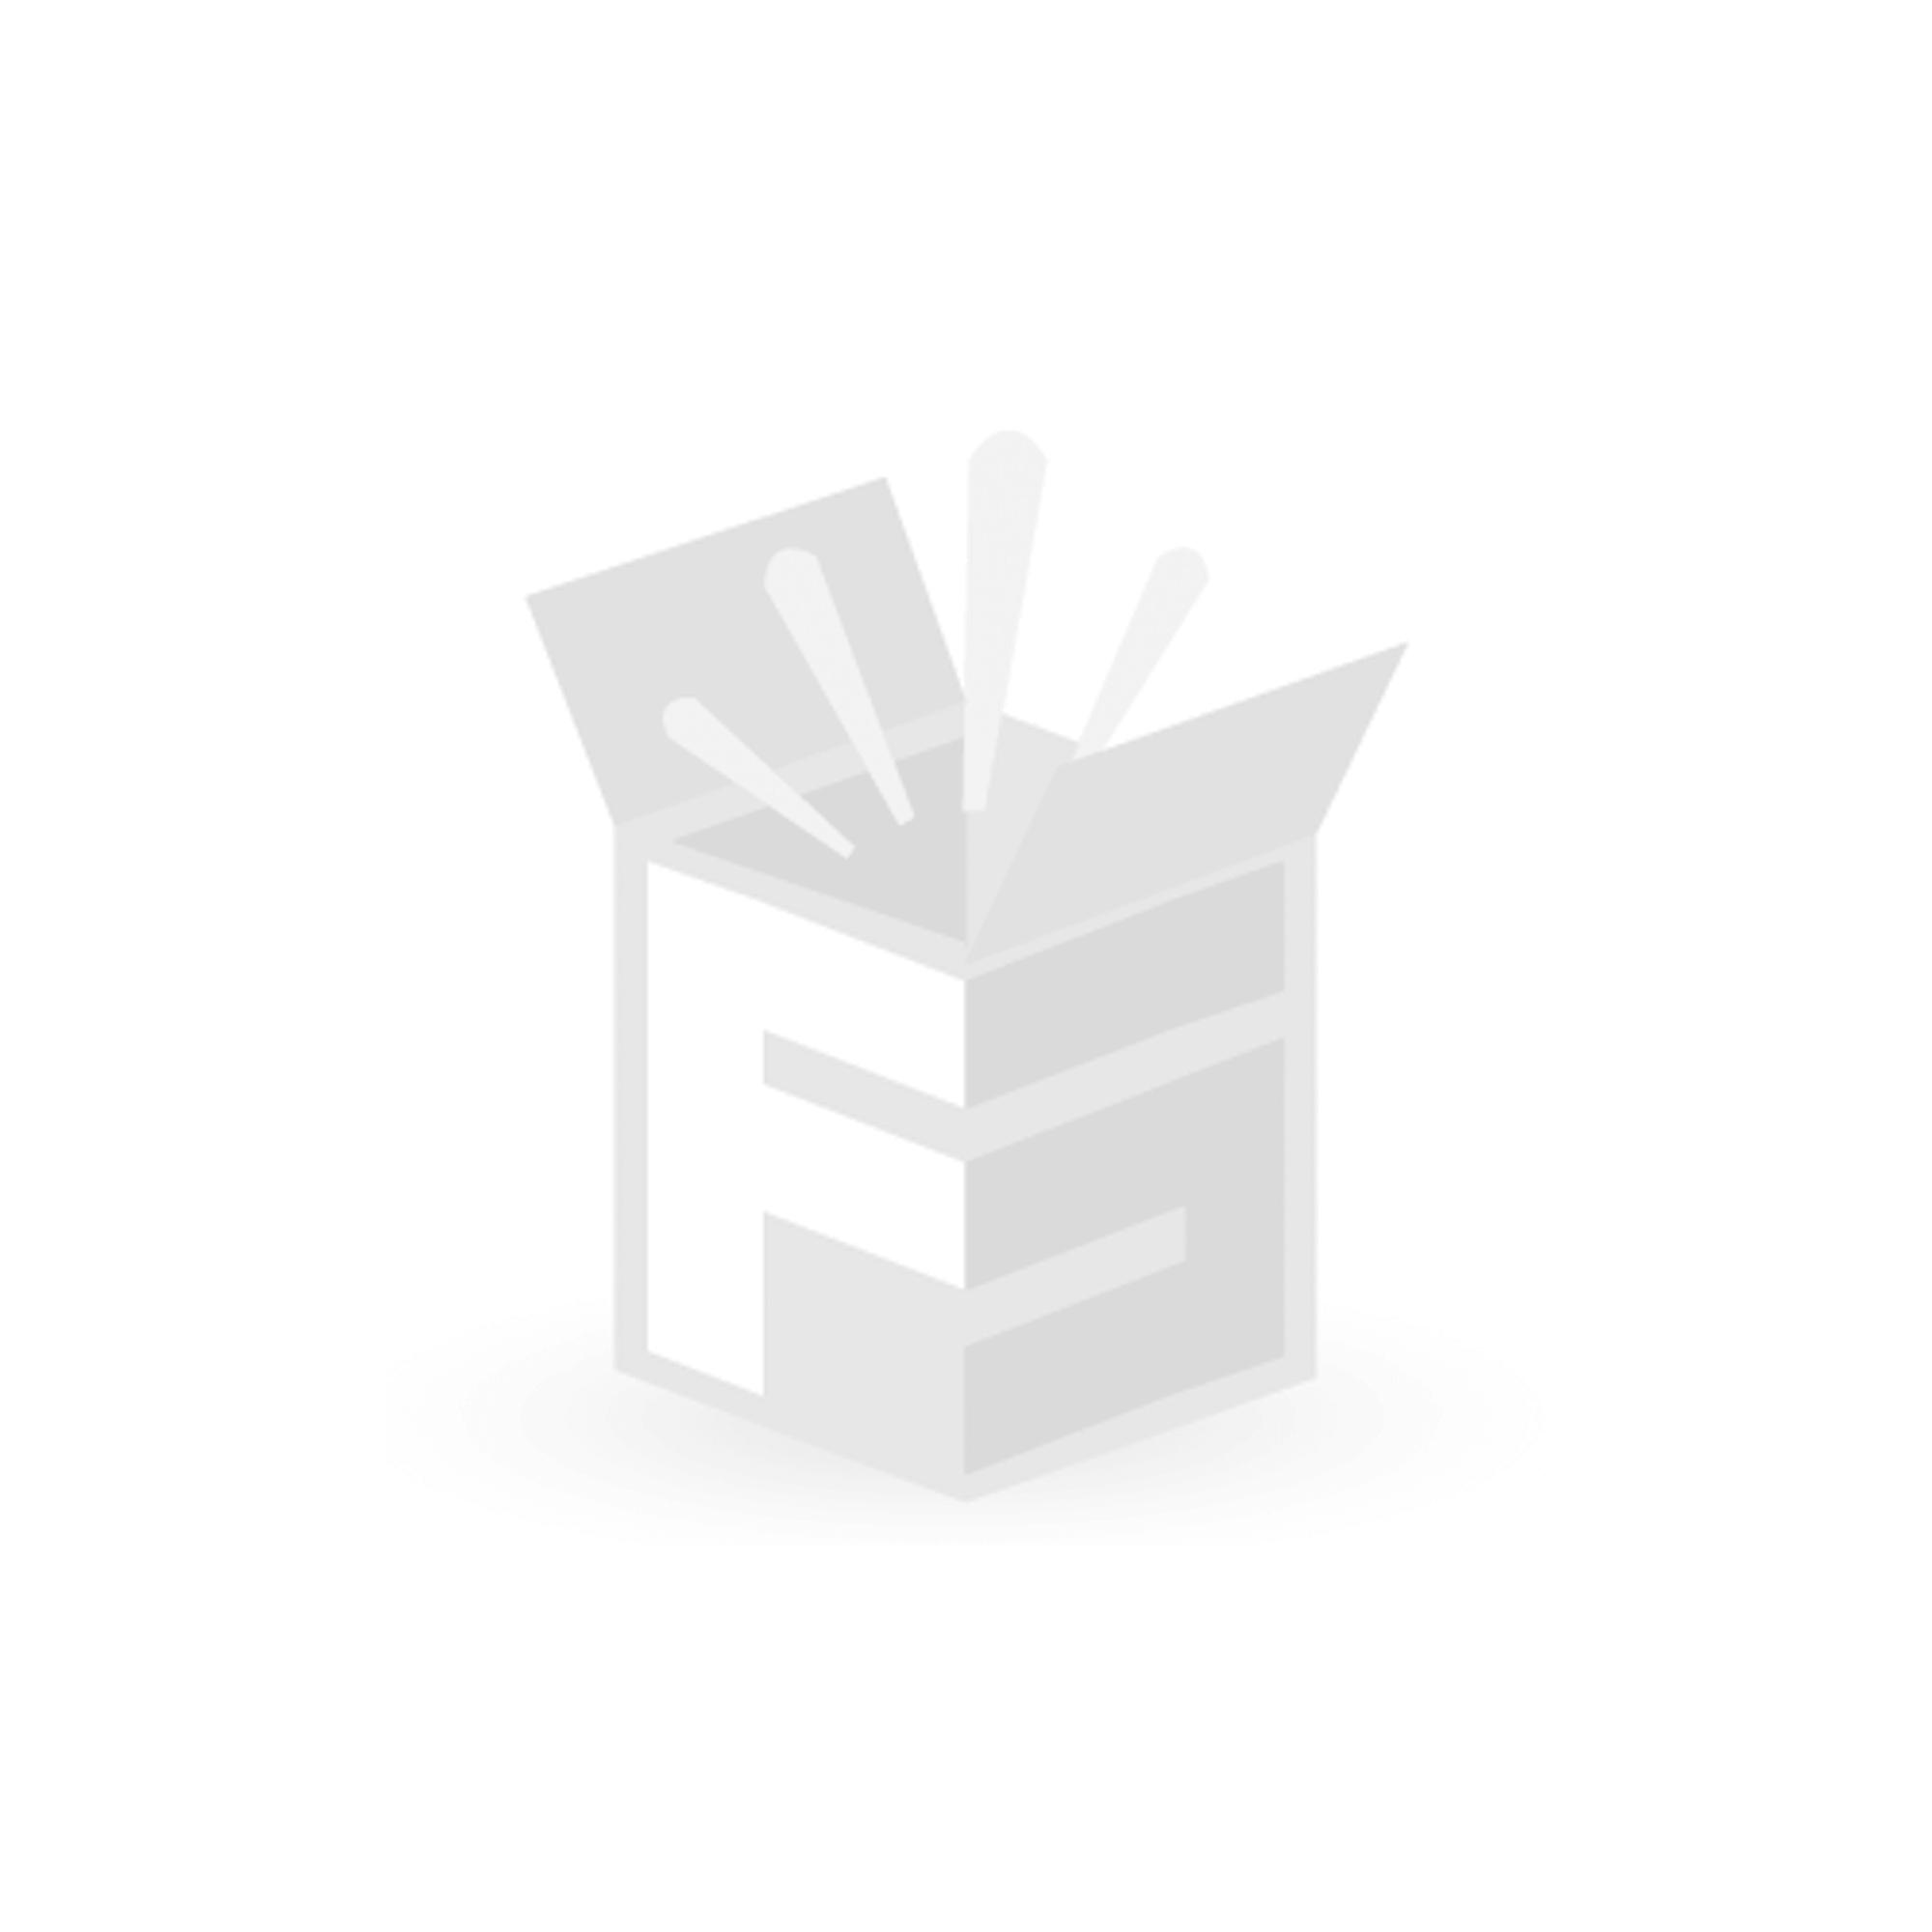 FS-STAR Schalen Koffer-Set 3-teilig